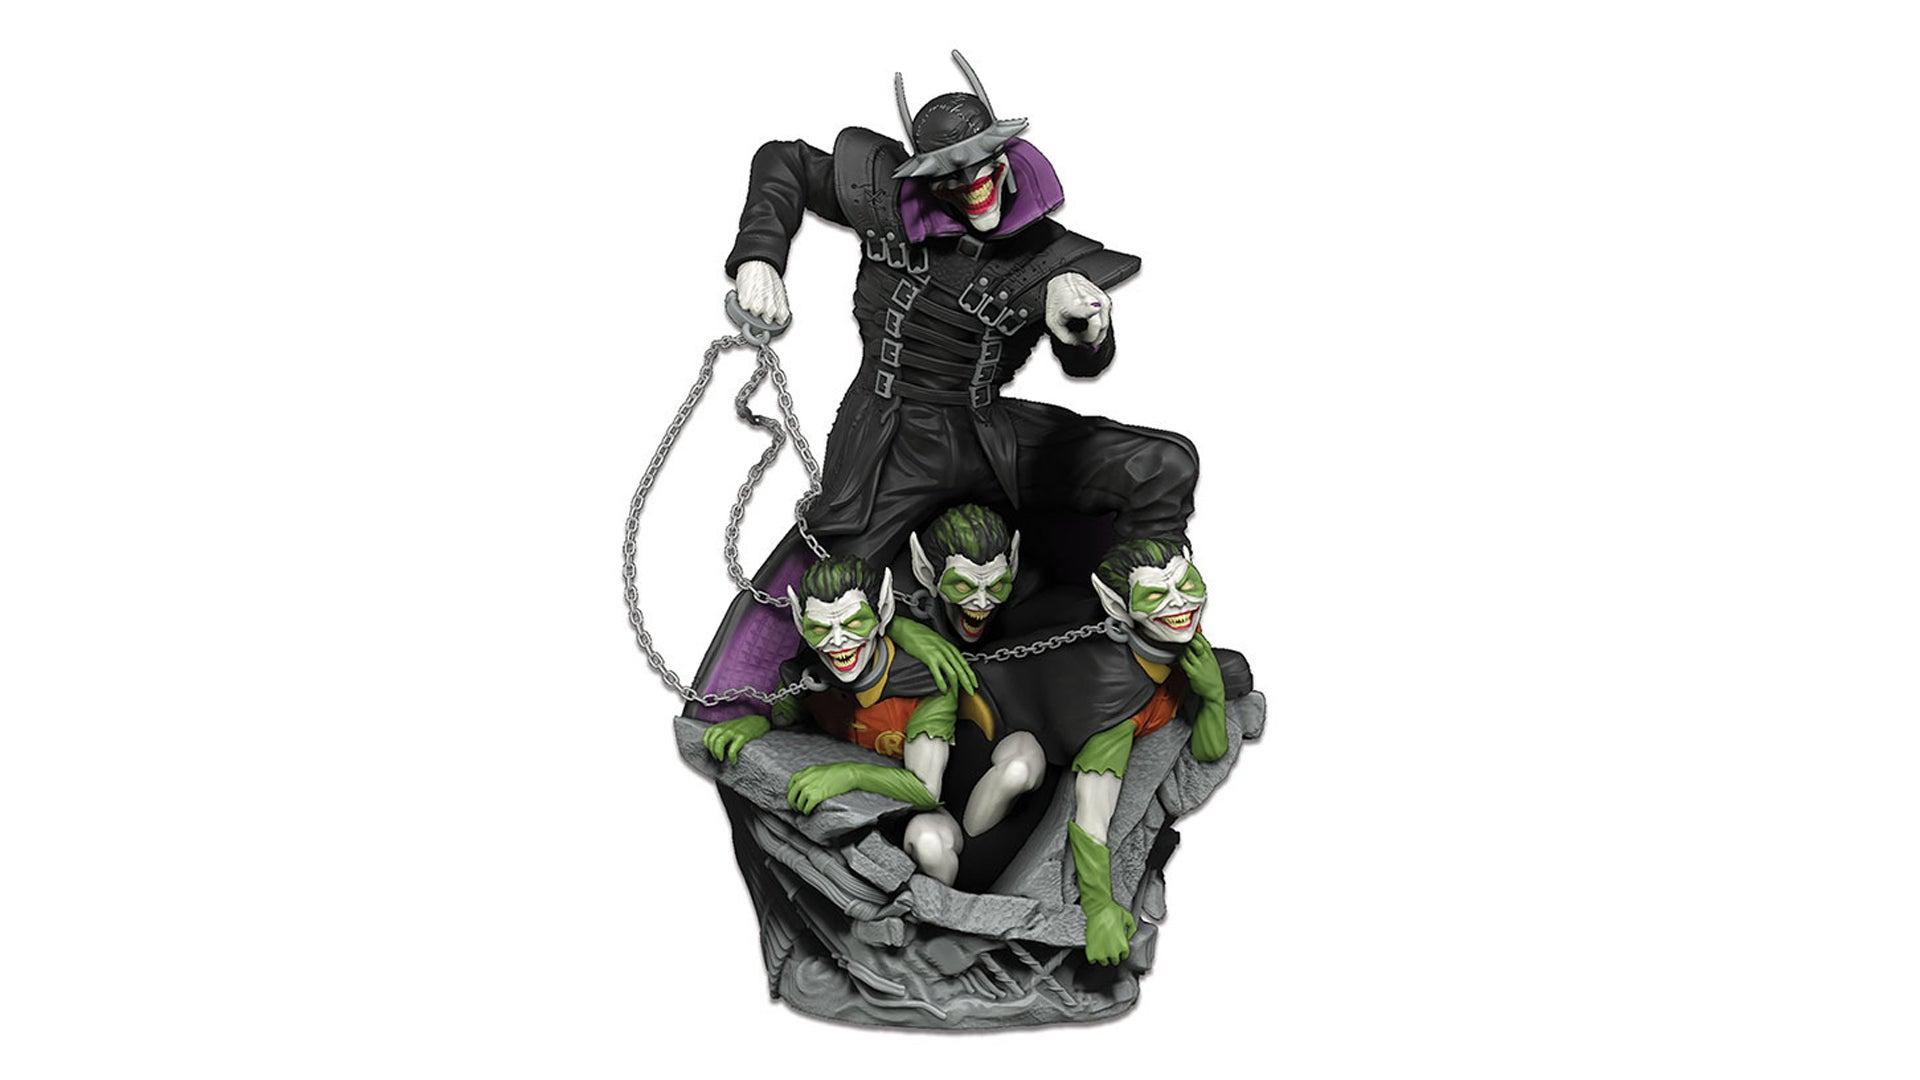 The Batman Who Laughs Rising board game miniature